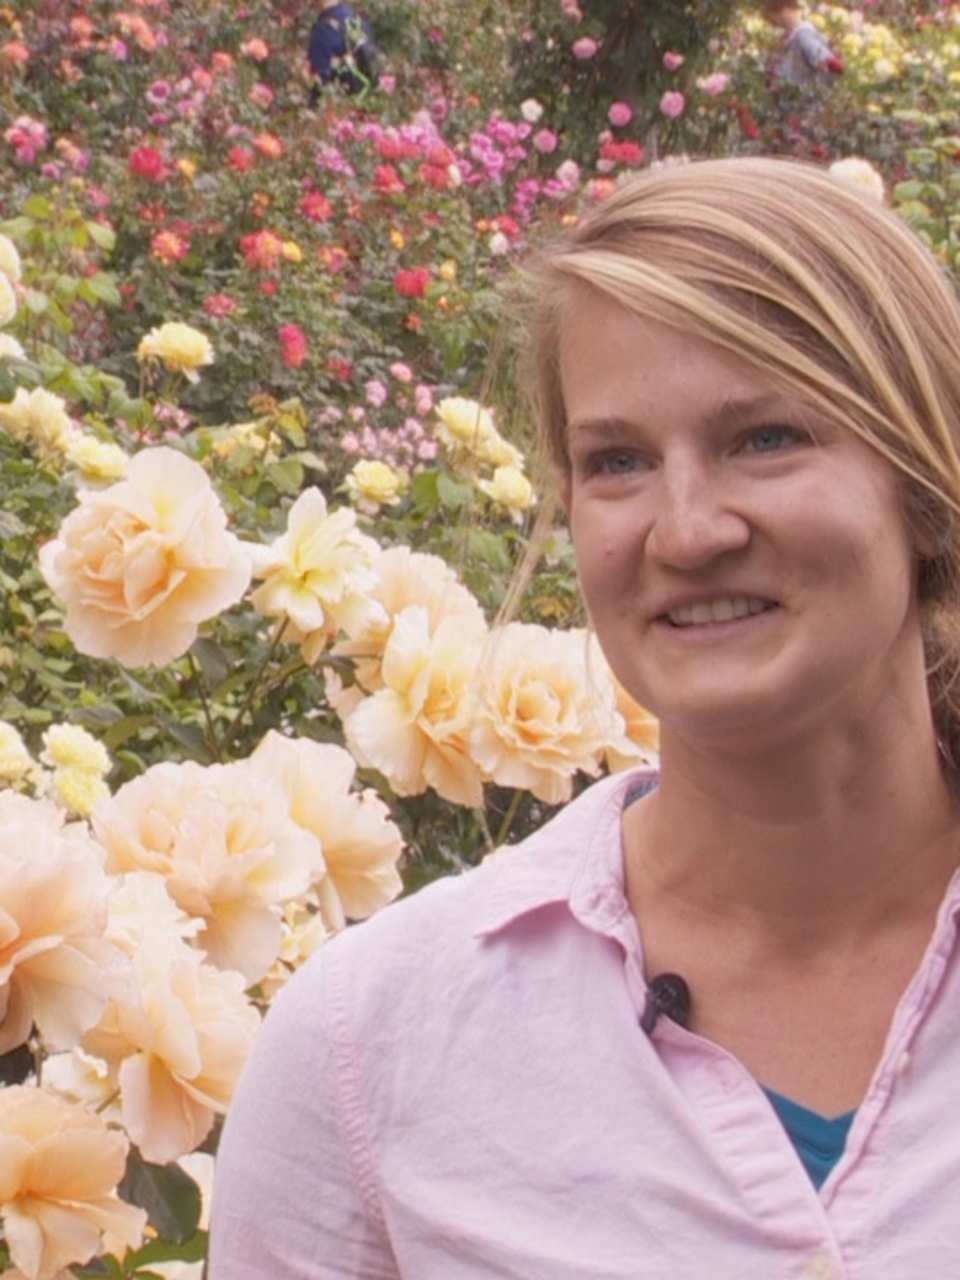 Everyday Hero Rachel Burlington Is The First Woman Curator At